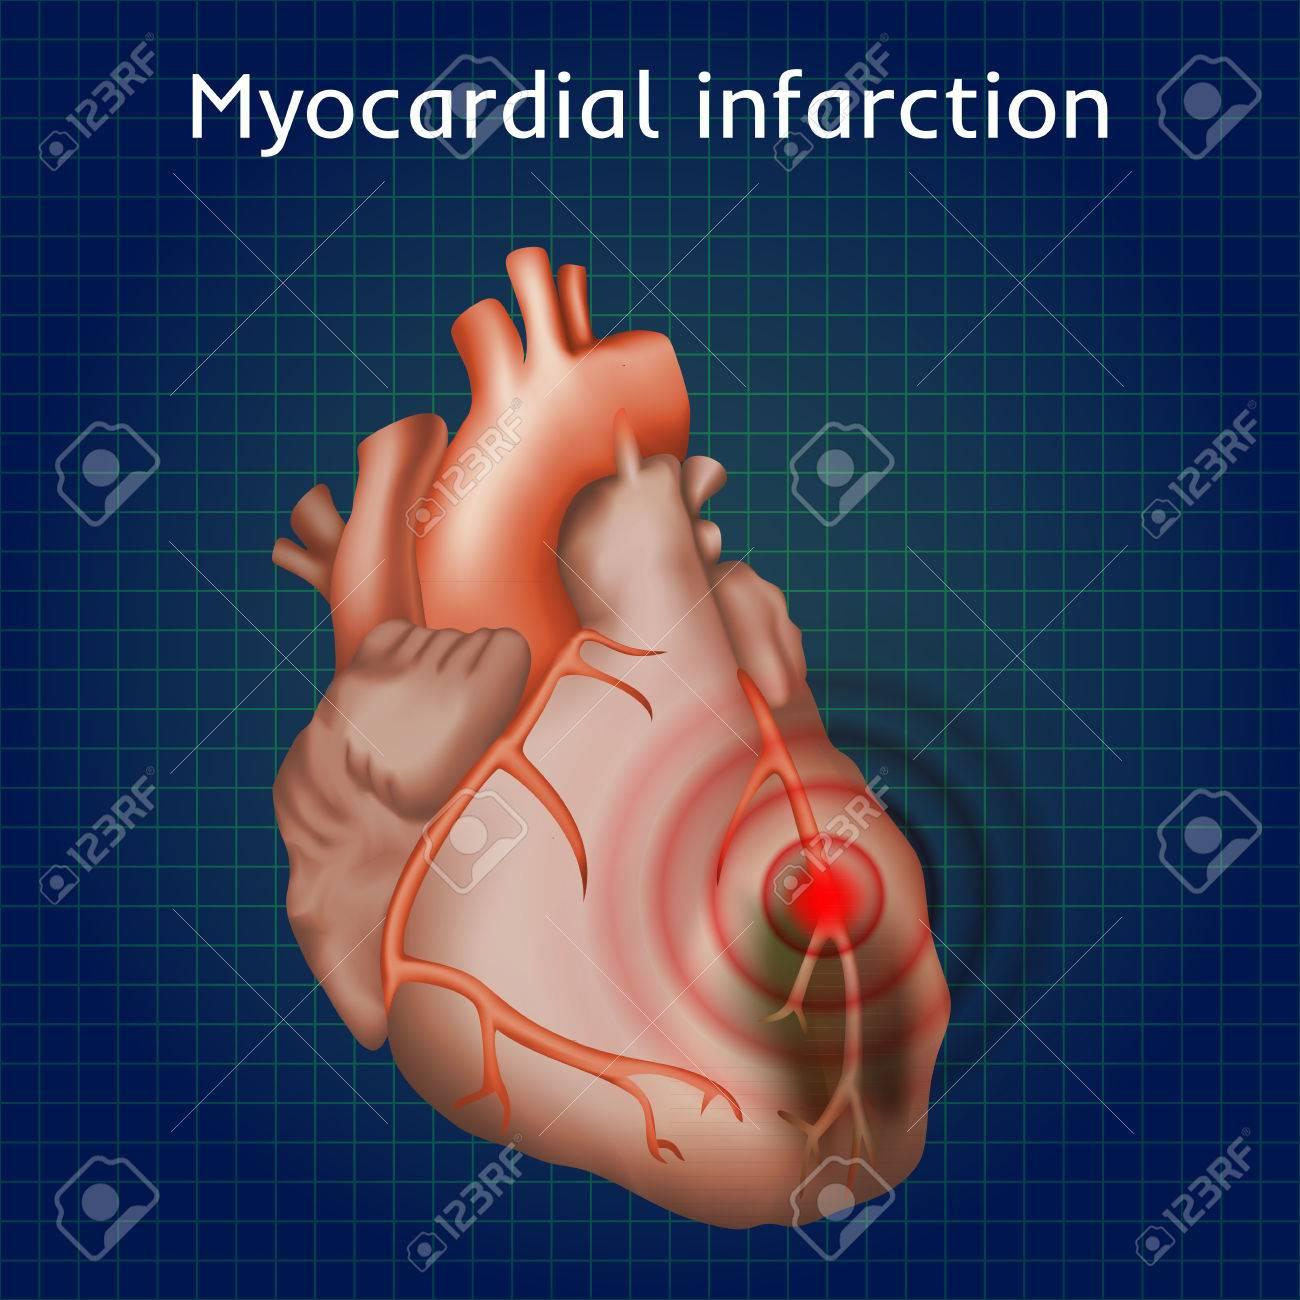 Herzinfarkt. Herzinfarkt, Schmerzen. Geschädigten Herzmuskel ...